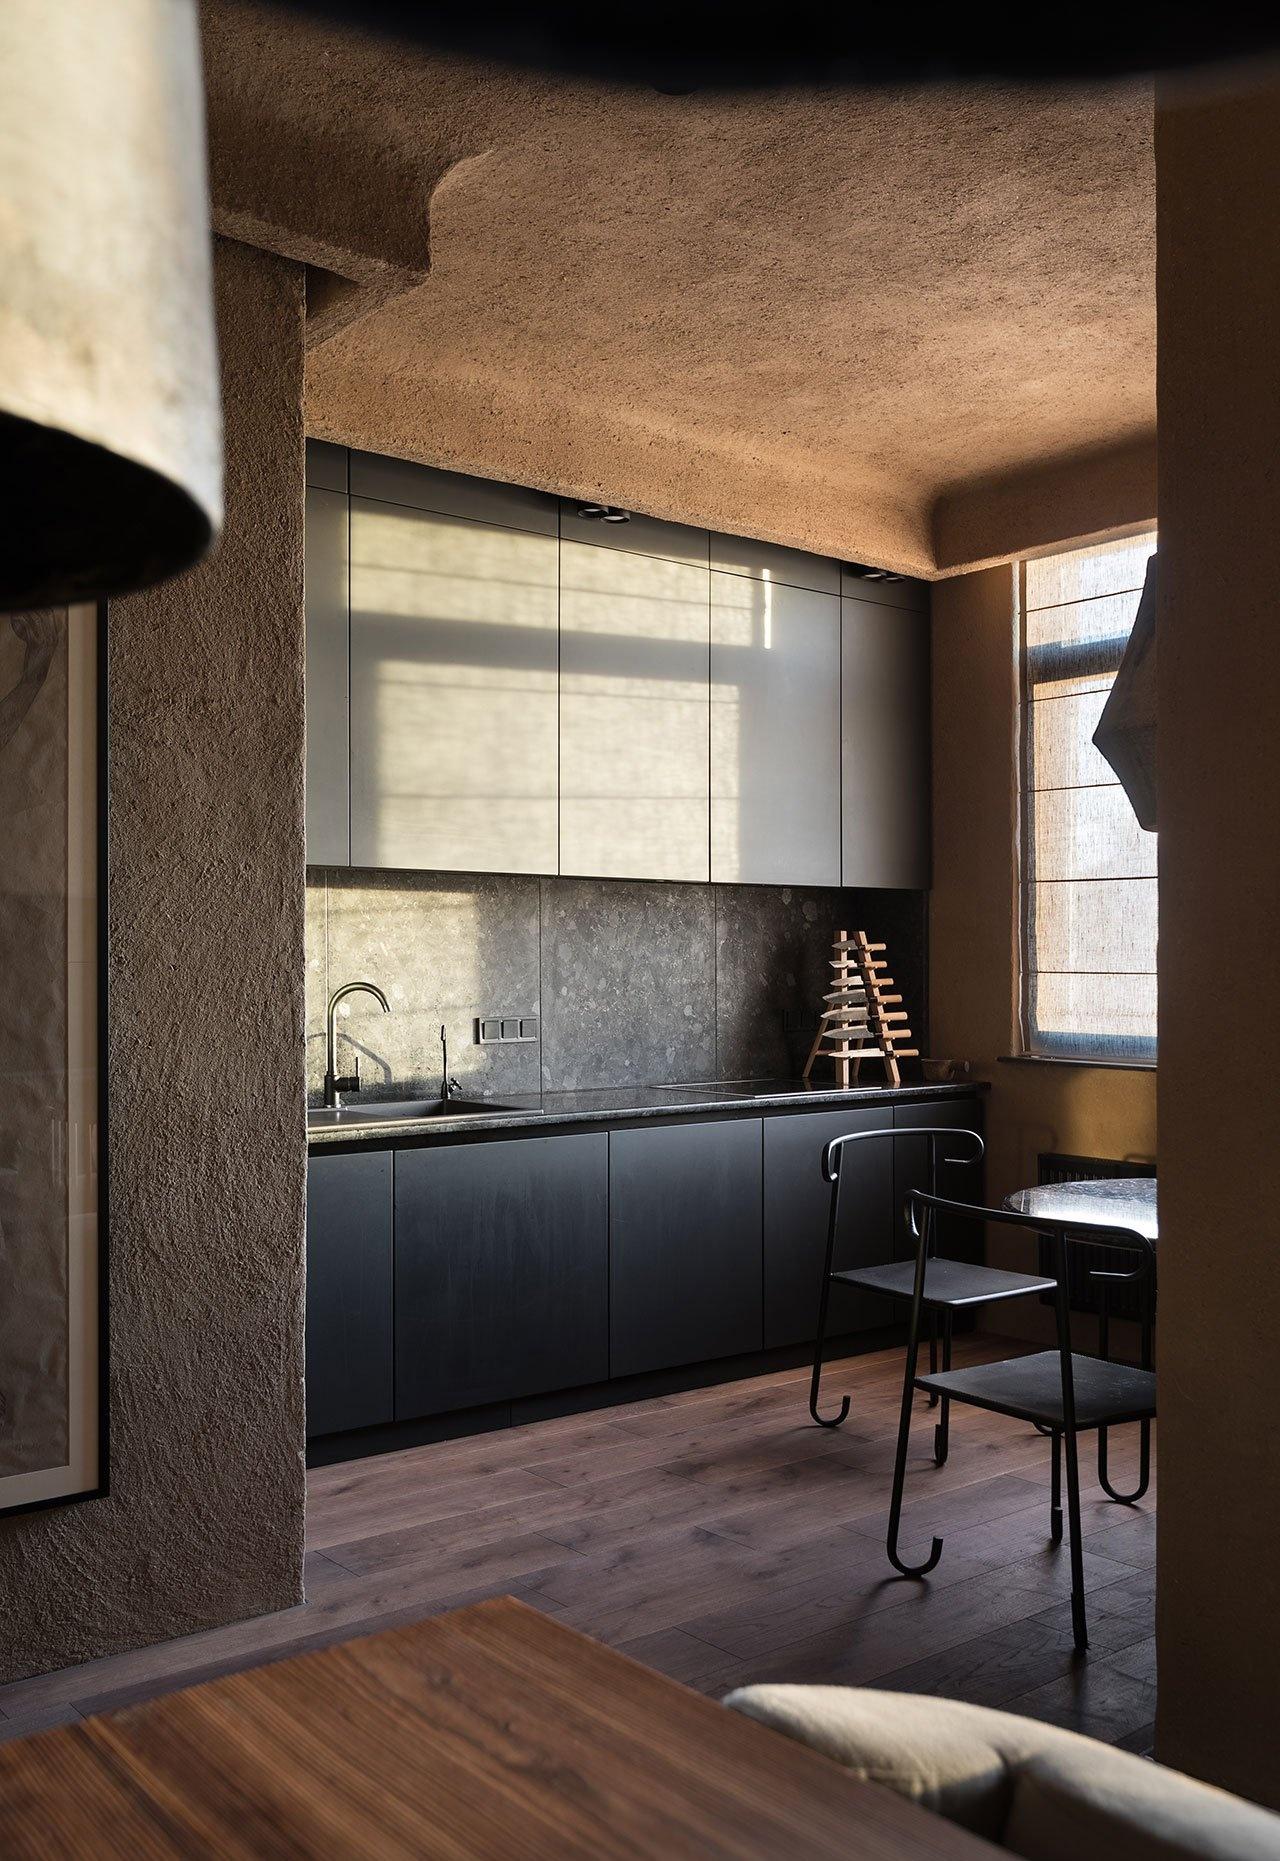 s4_wabi_sabi_apartment_by_sergey_makhno_architects_yatzer